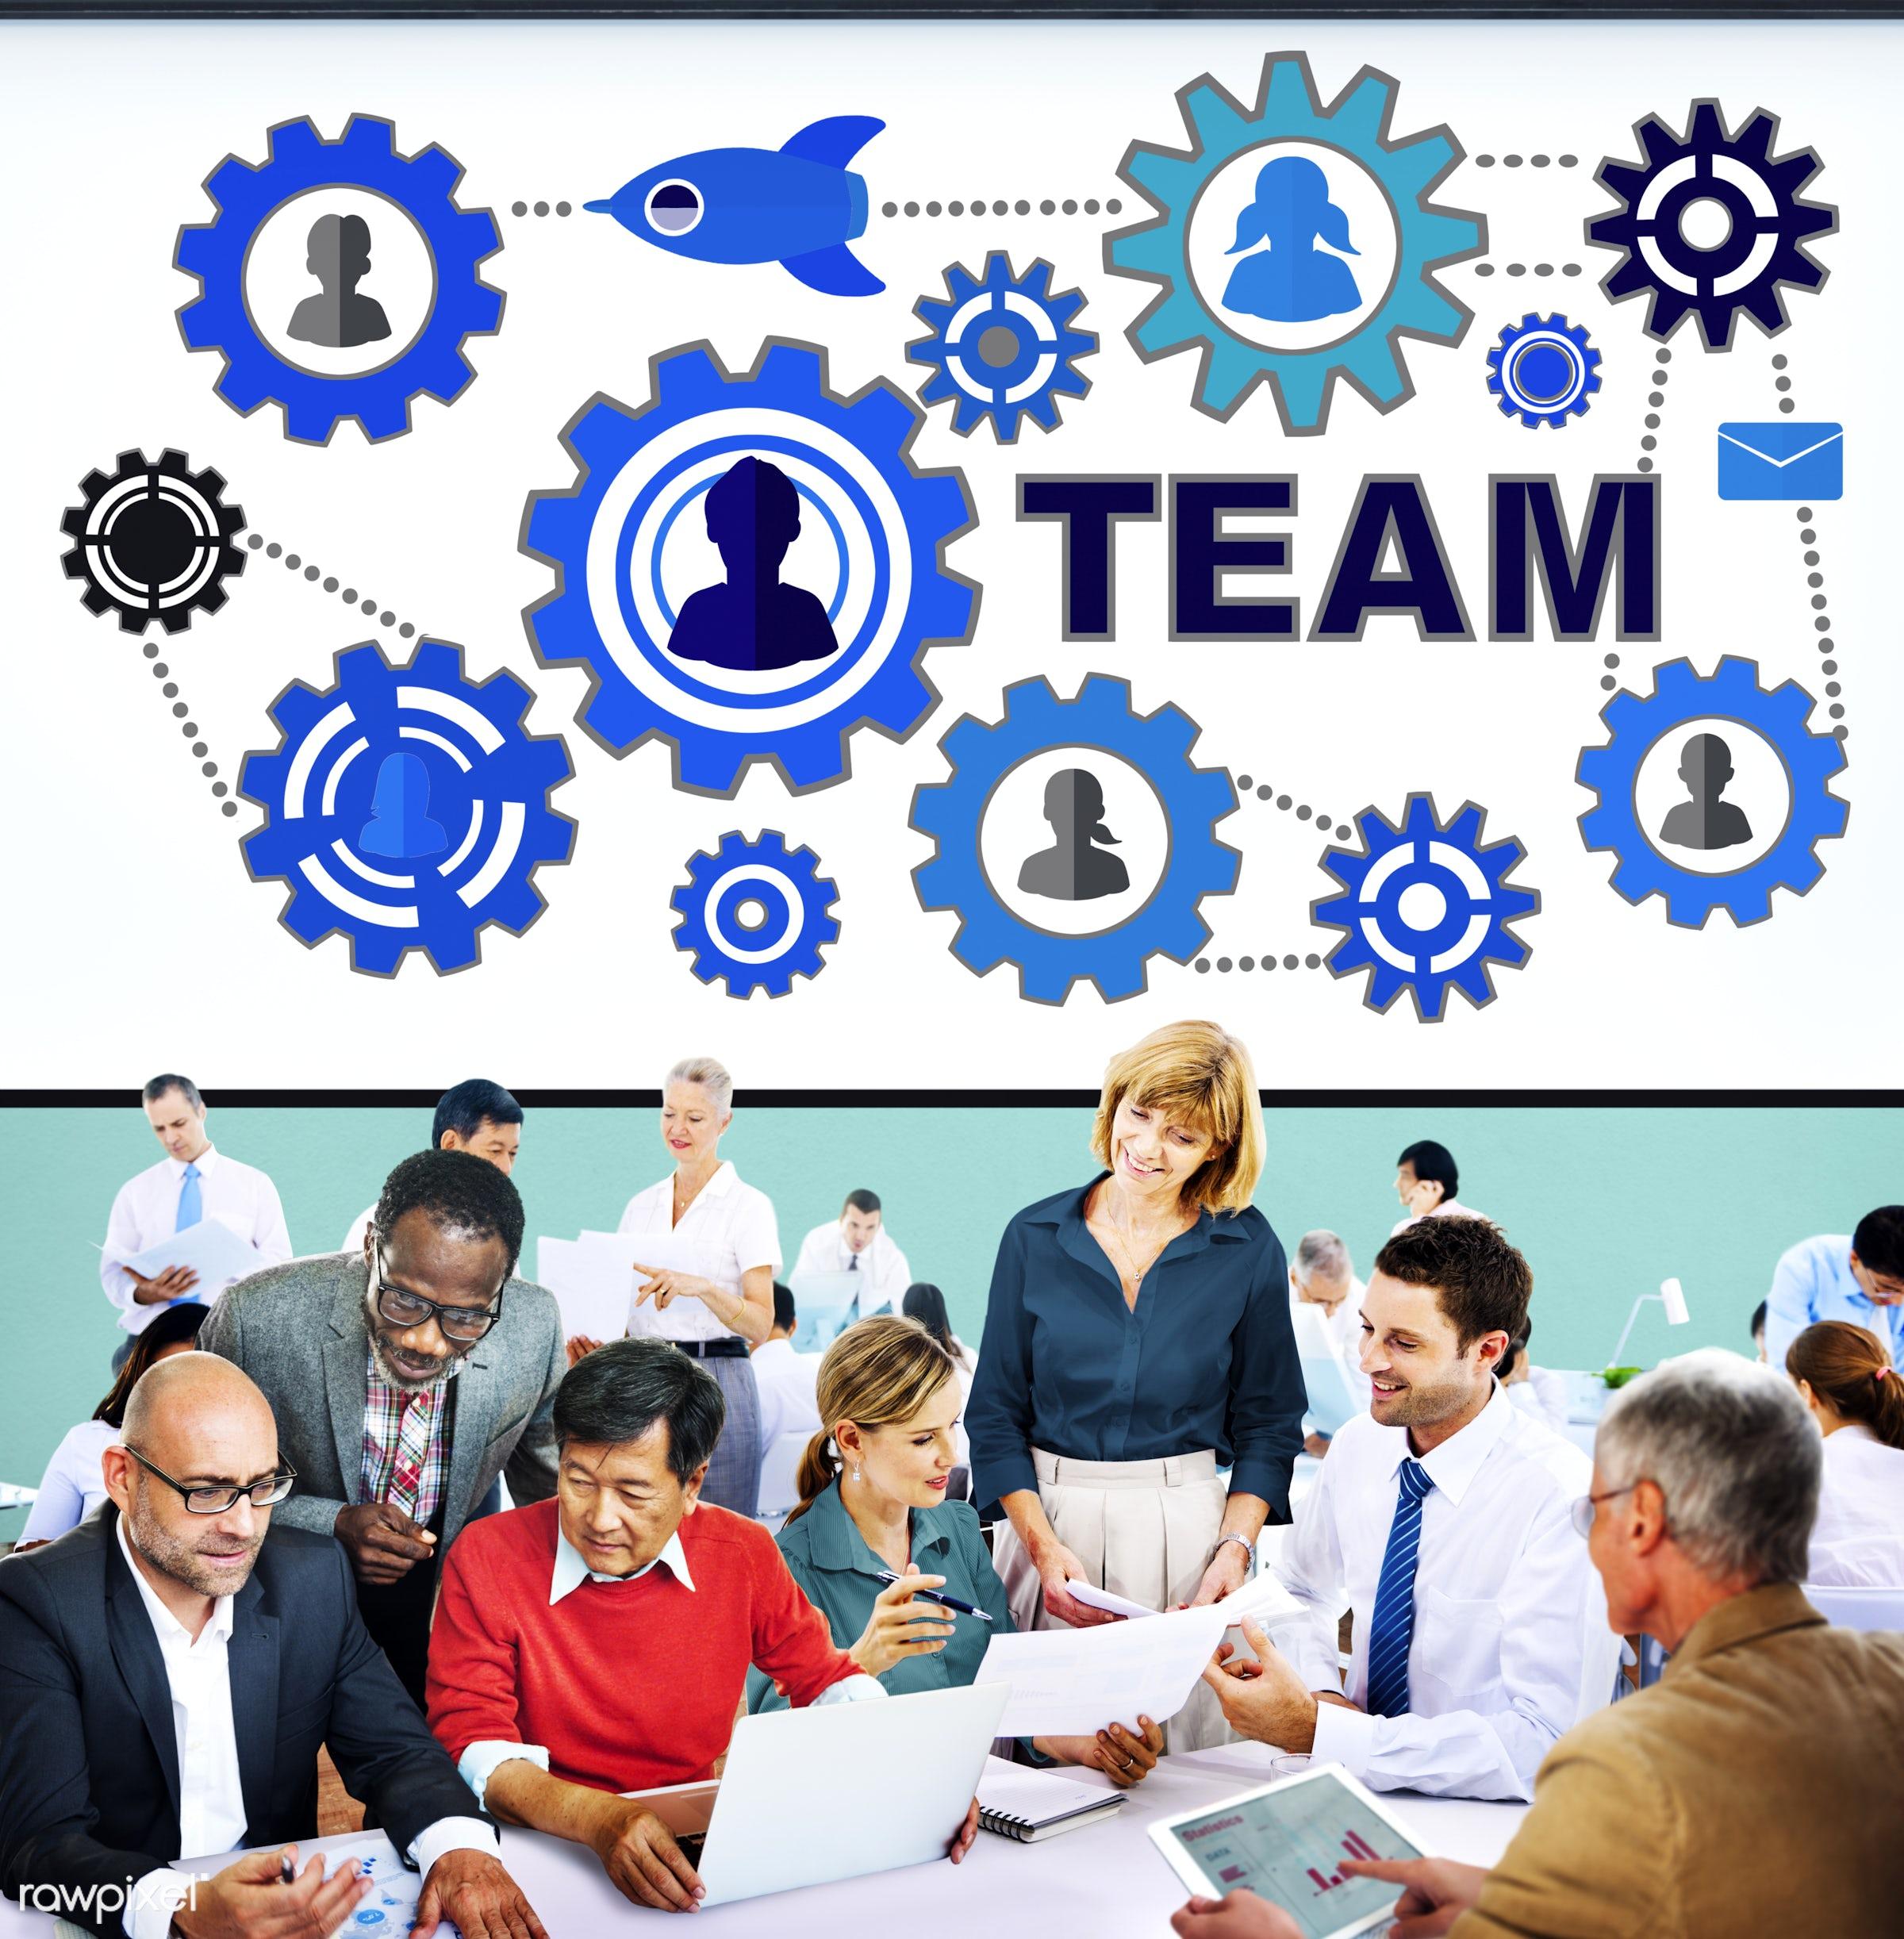 achievement, agreement, ambition, analysis, business, business people, businessmen, businesswomen, busy, collaboration,...